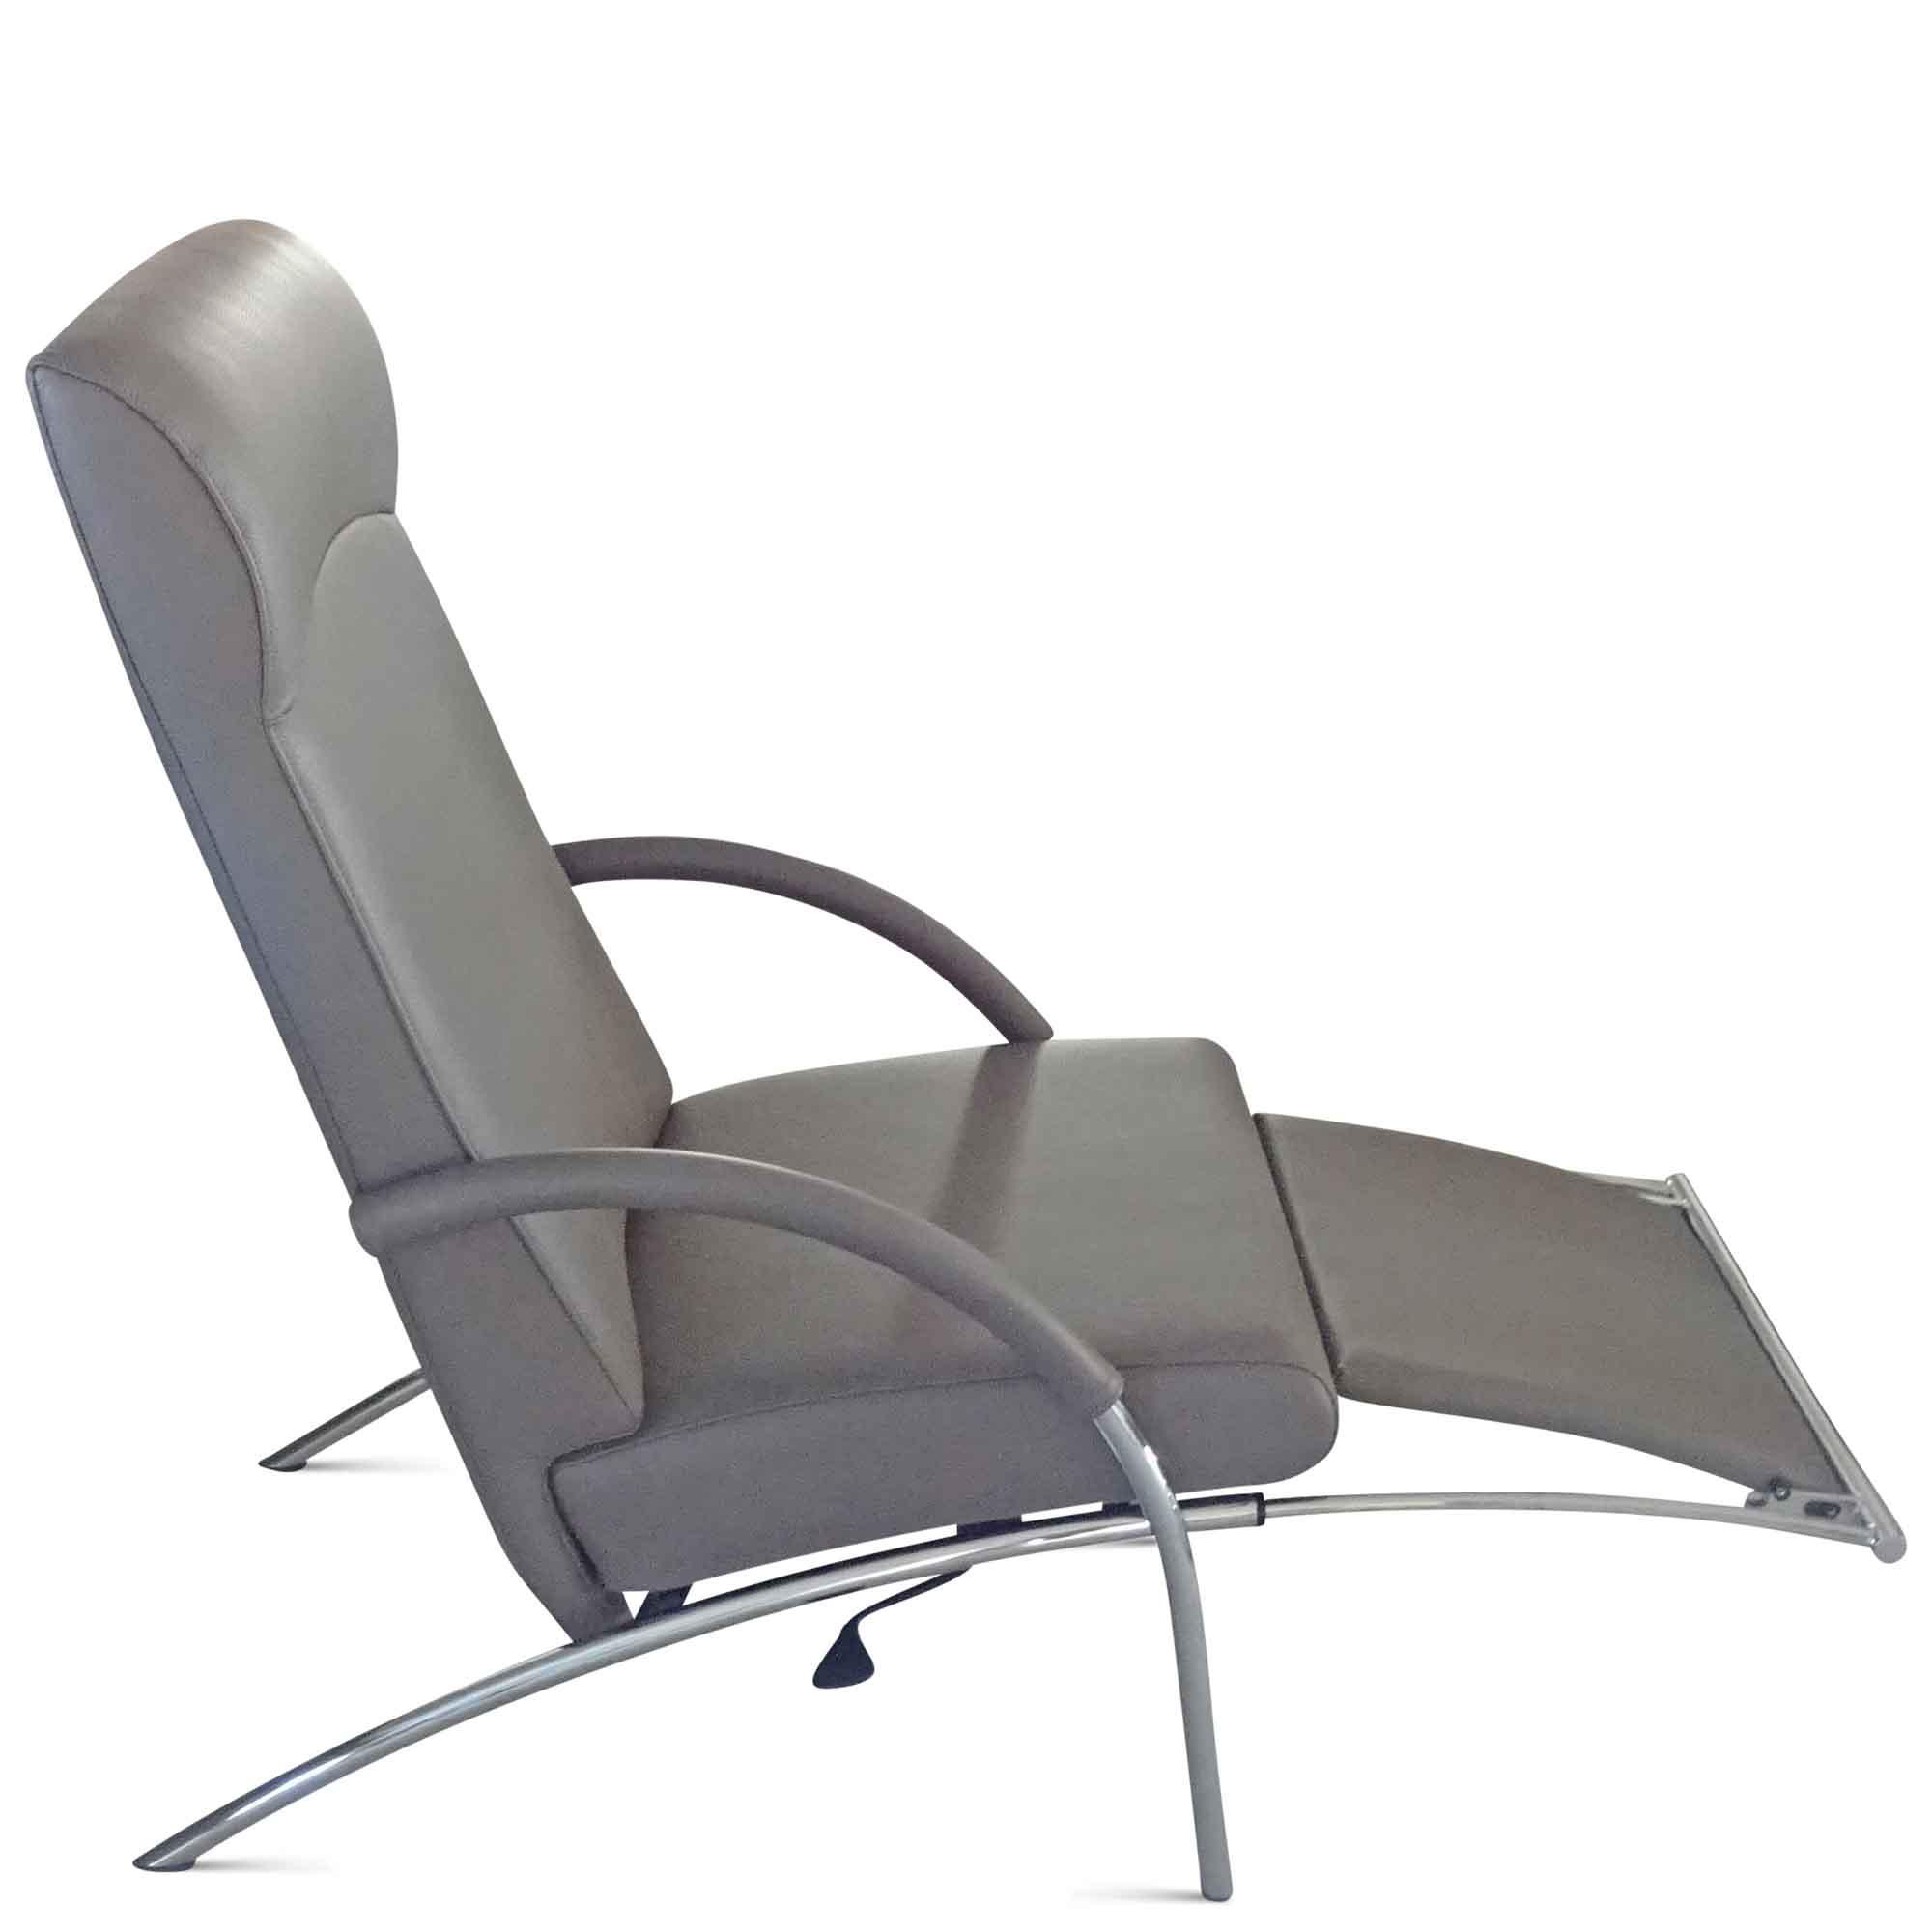 Ip Design Designer Sessel Curve In Grau Leder Stahl Grau Chrom Ebay